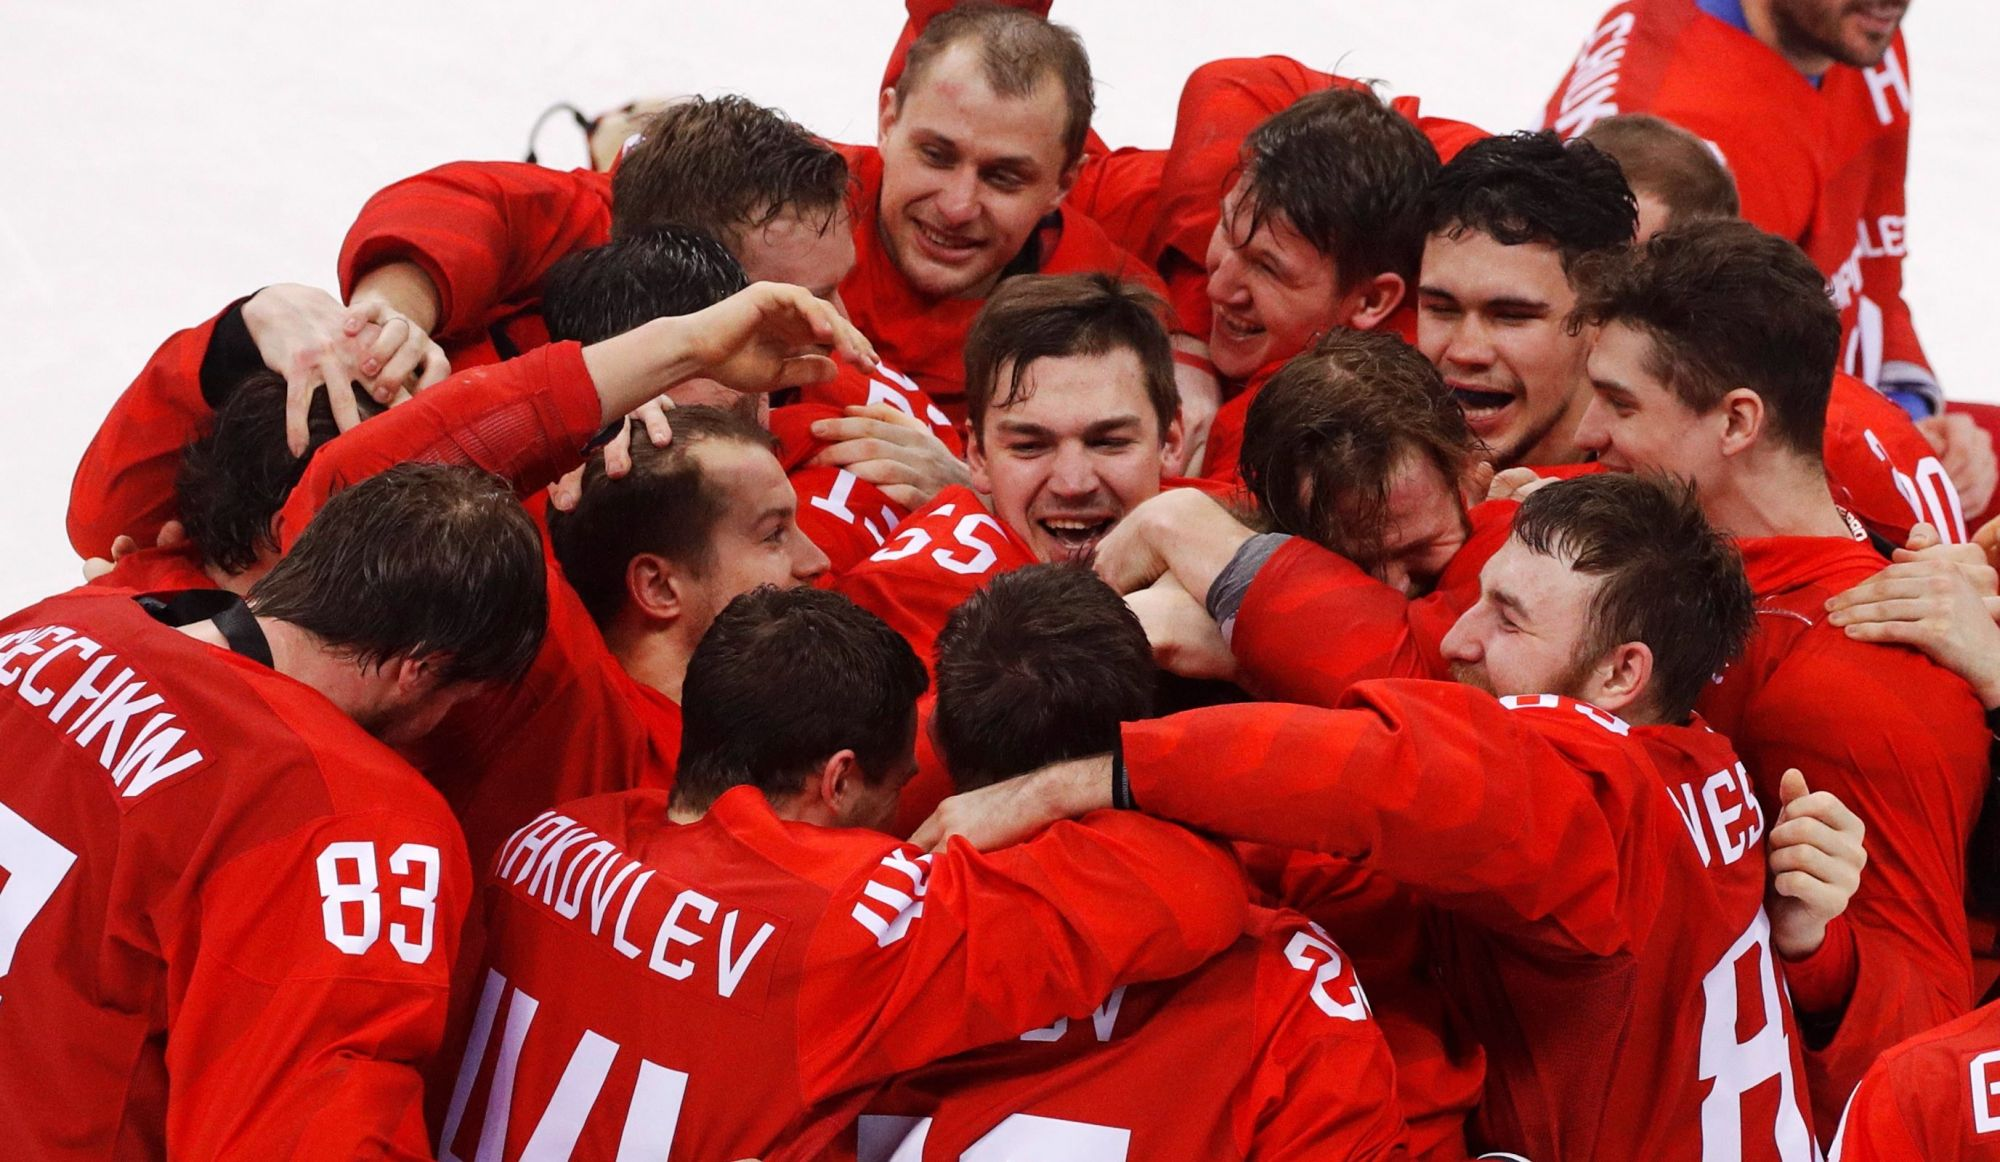 Les Russes sont champions olympiques